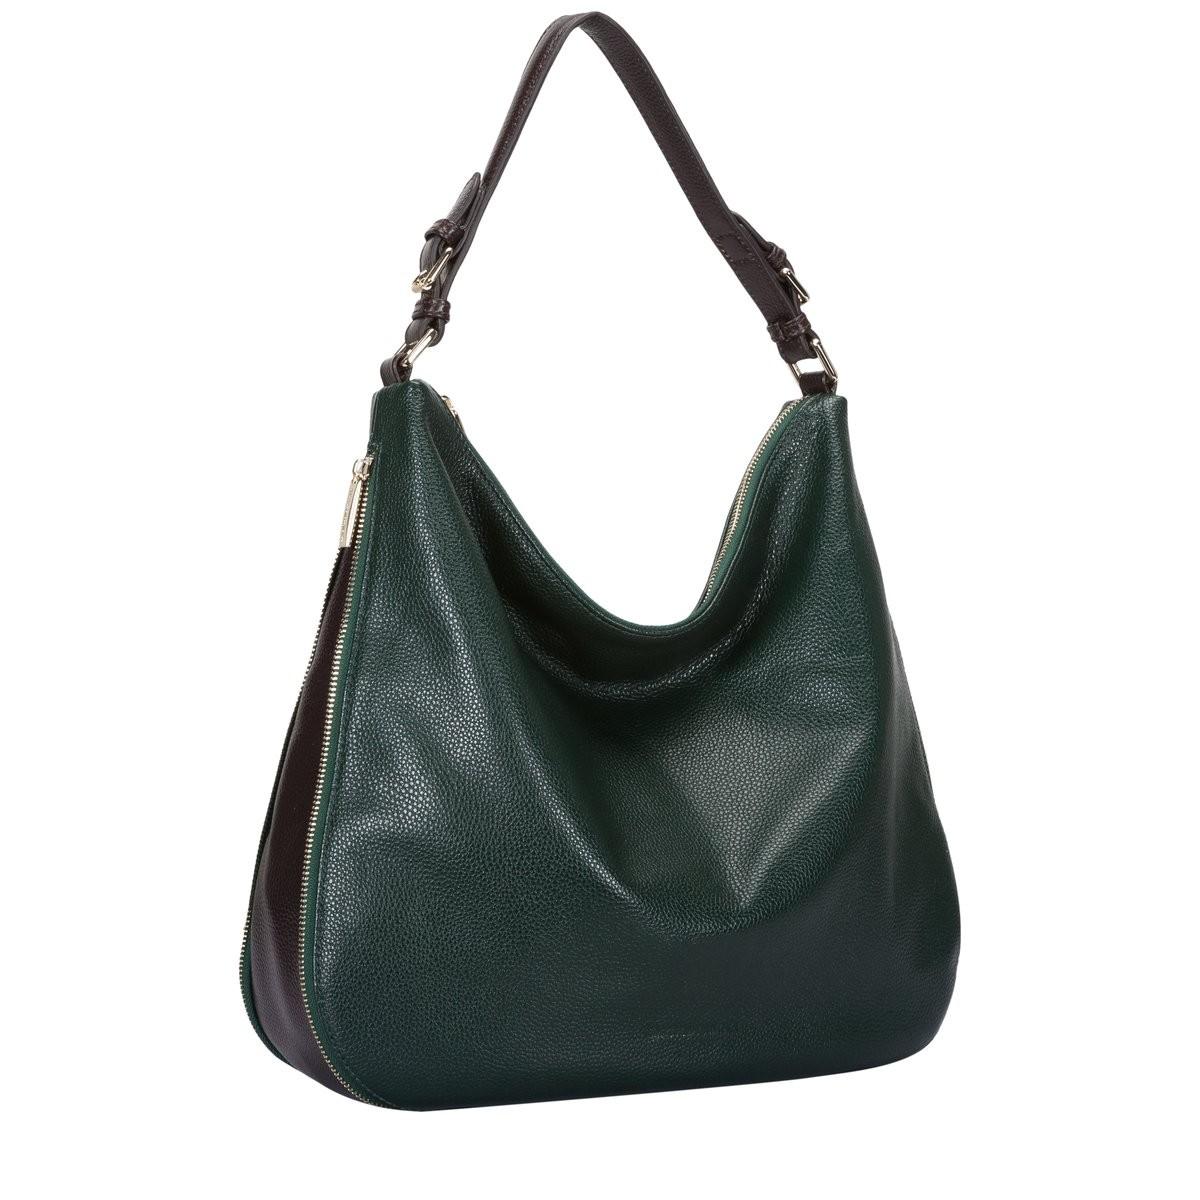 ed15ffa4da Althorp Single Strap Hobo Style Shoulder Bag